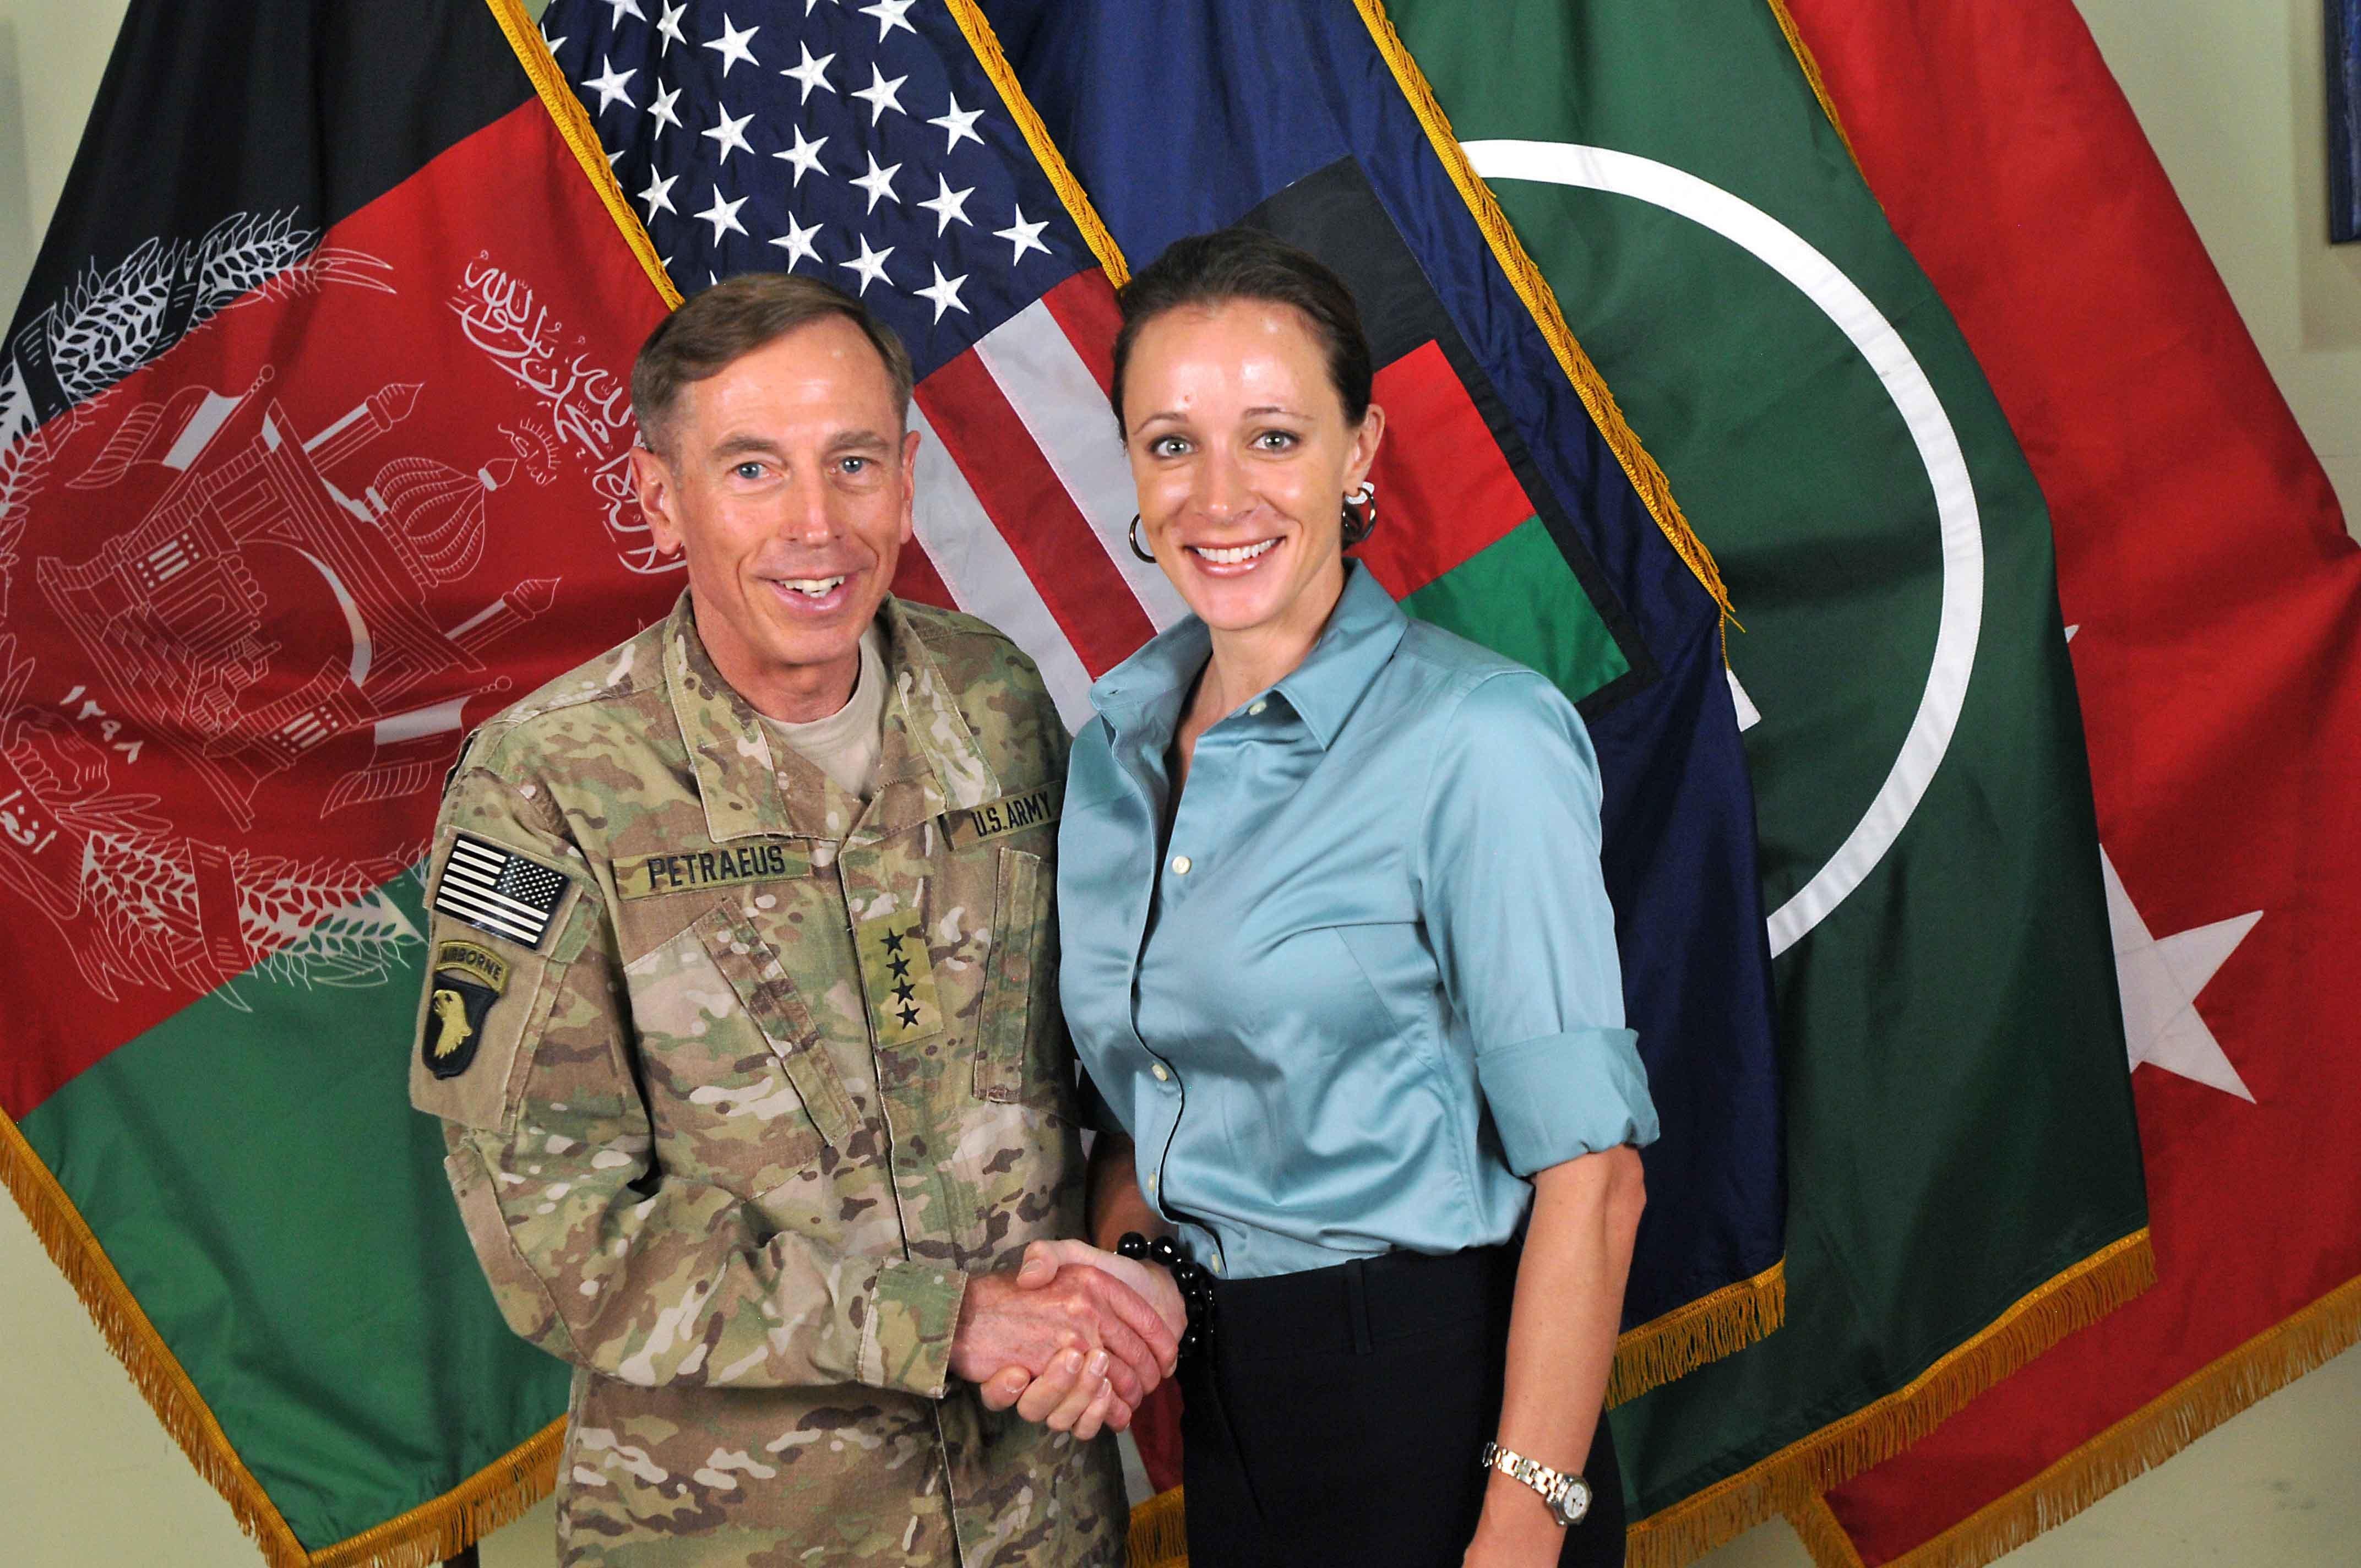 CIA Director Davis Petraeus with biographer Paula Broadwell on July 13, 2011. Petraeus resigned Nov. 9, 2012, citing an extra